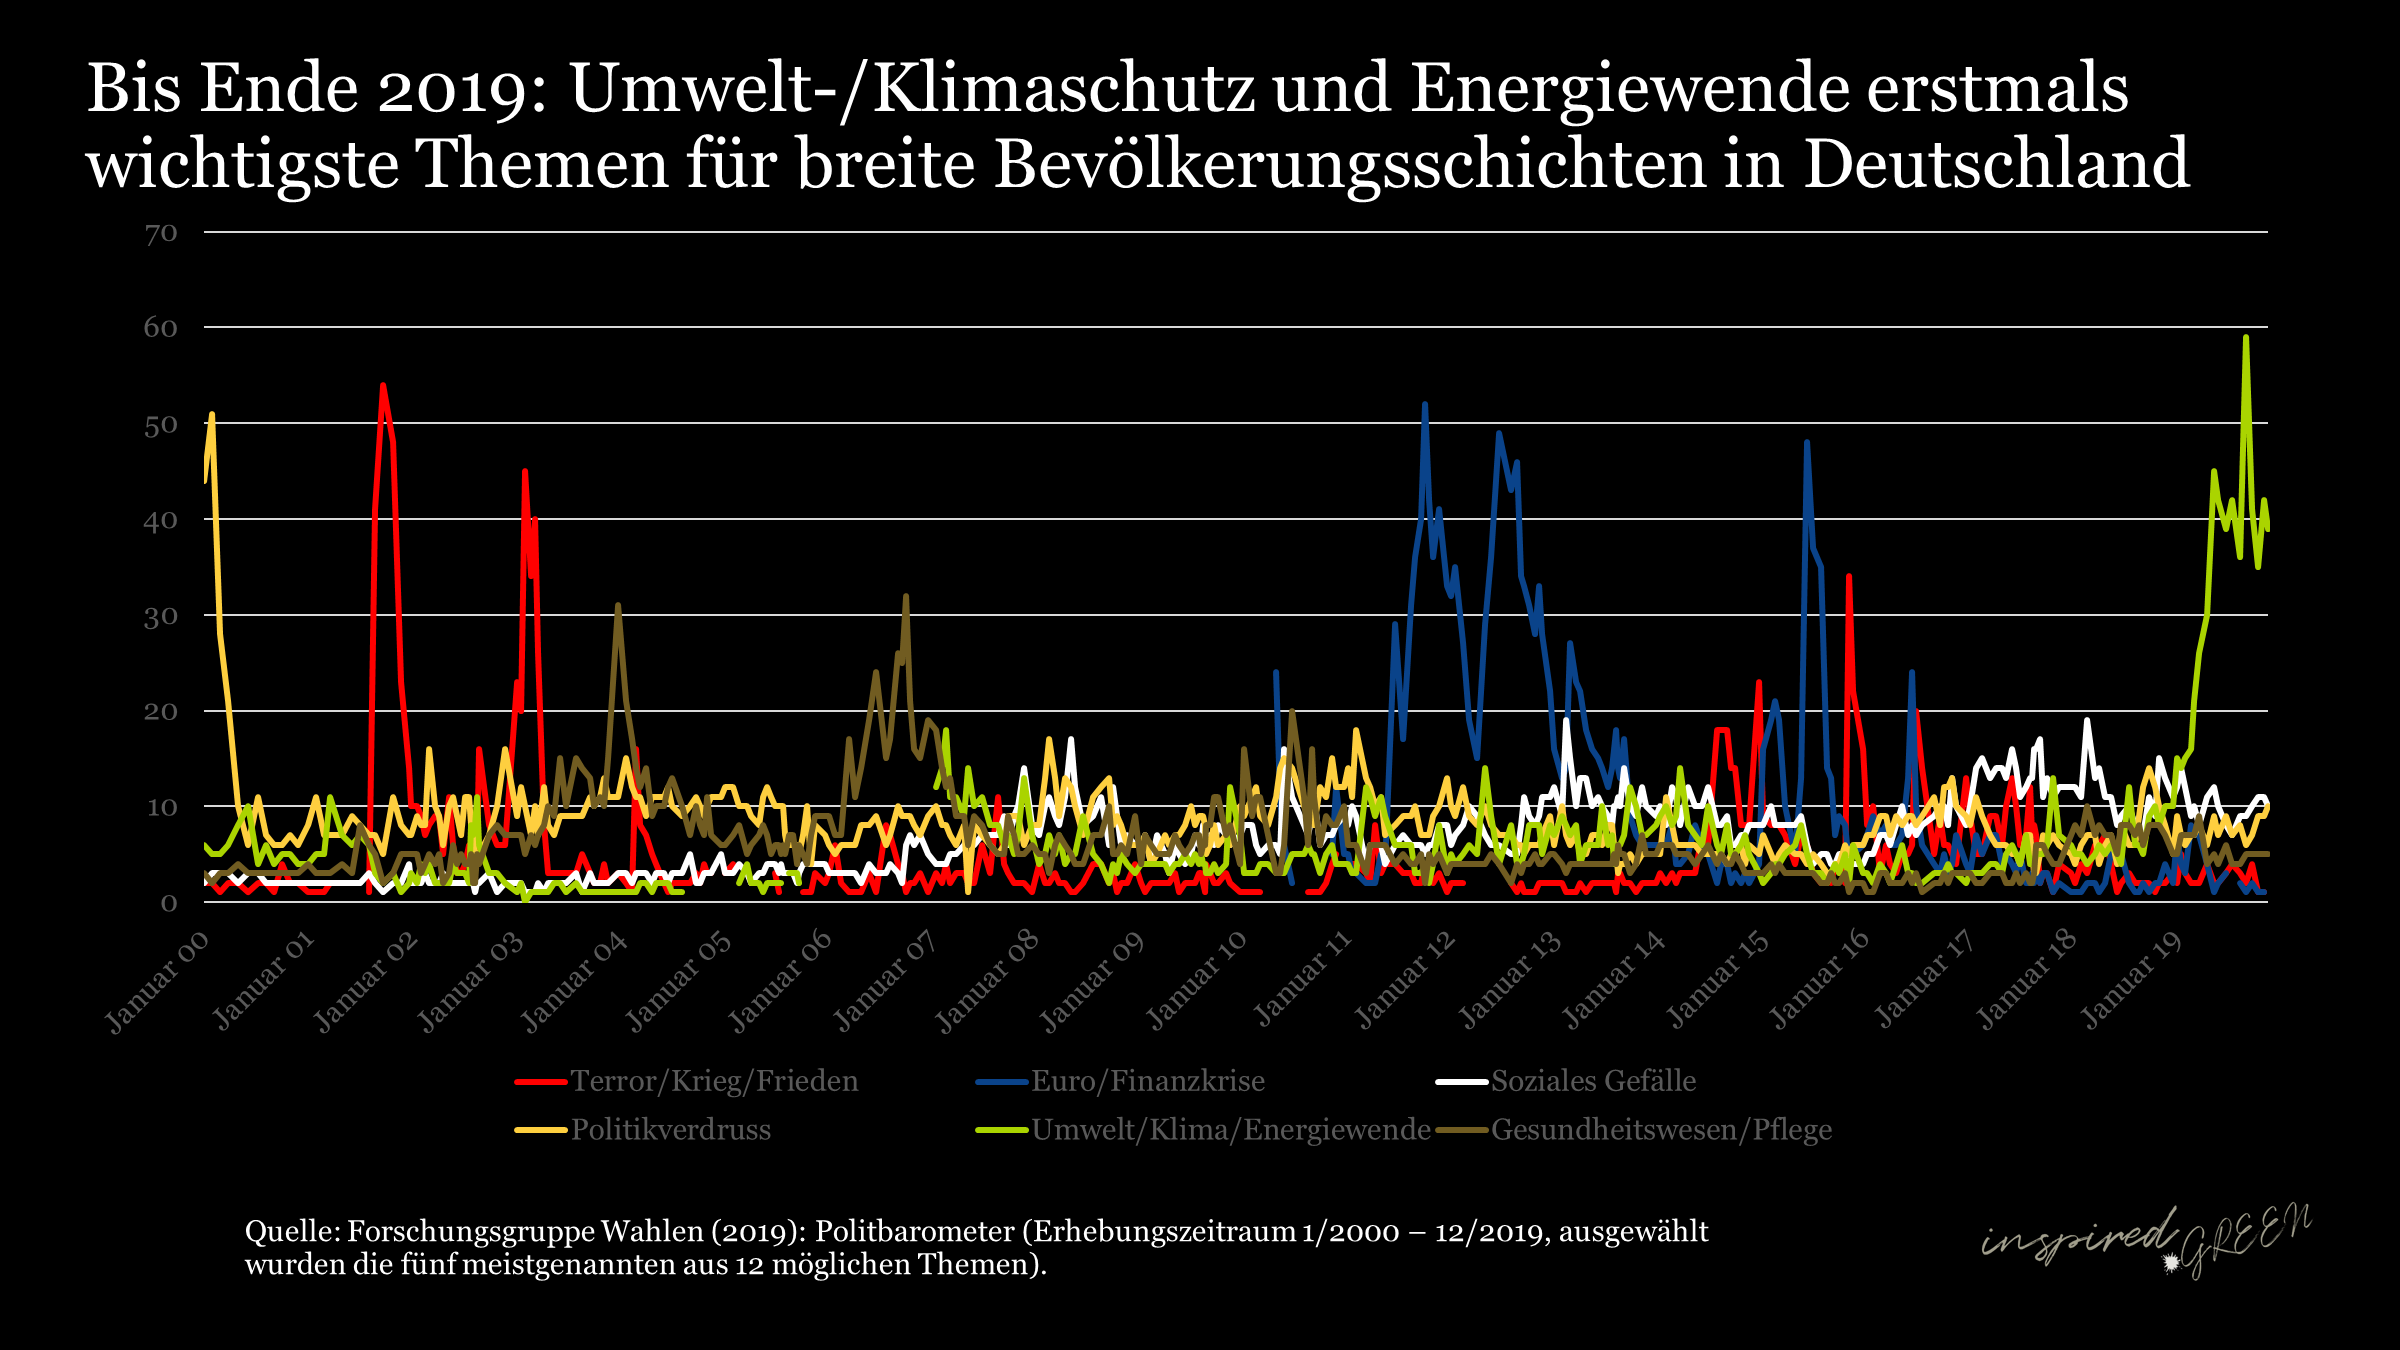 Umwelt-/Klima/Energiewende trotz Corona unter Top 3